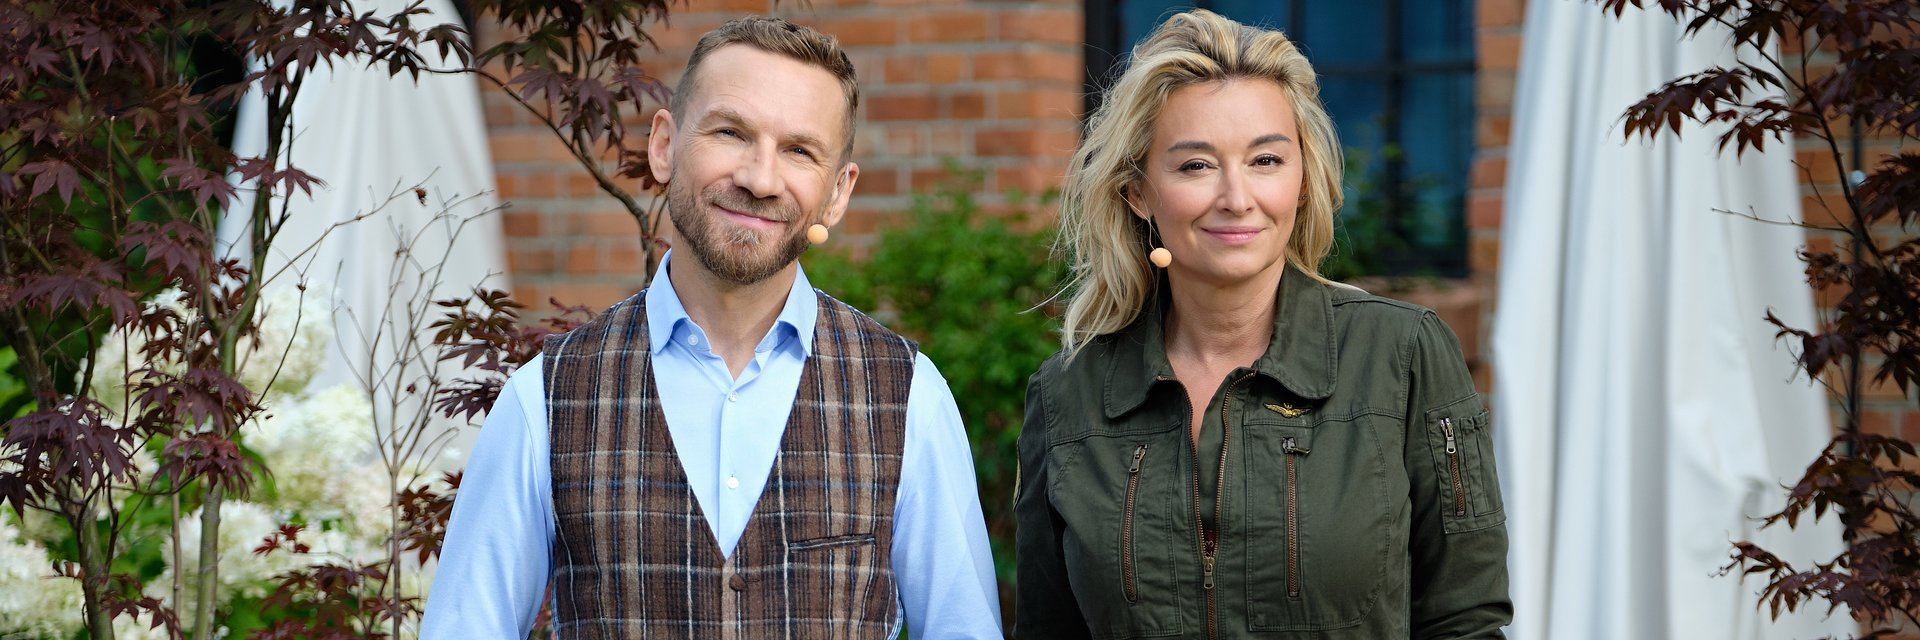 Jesiennie premiery TVN Discovery Polska